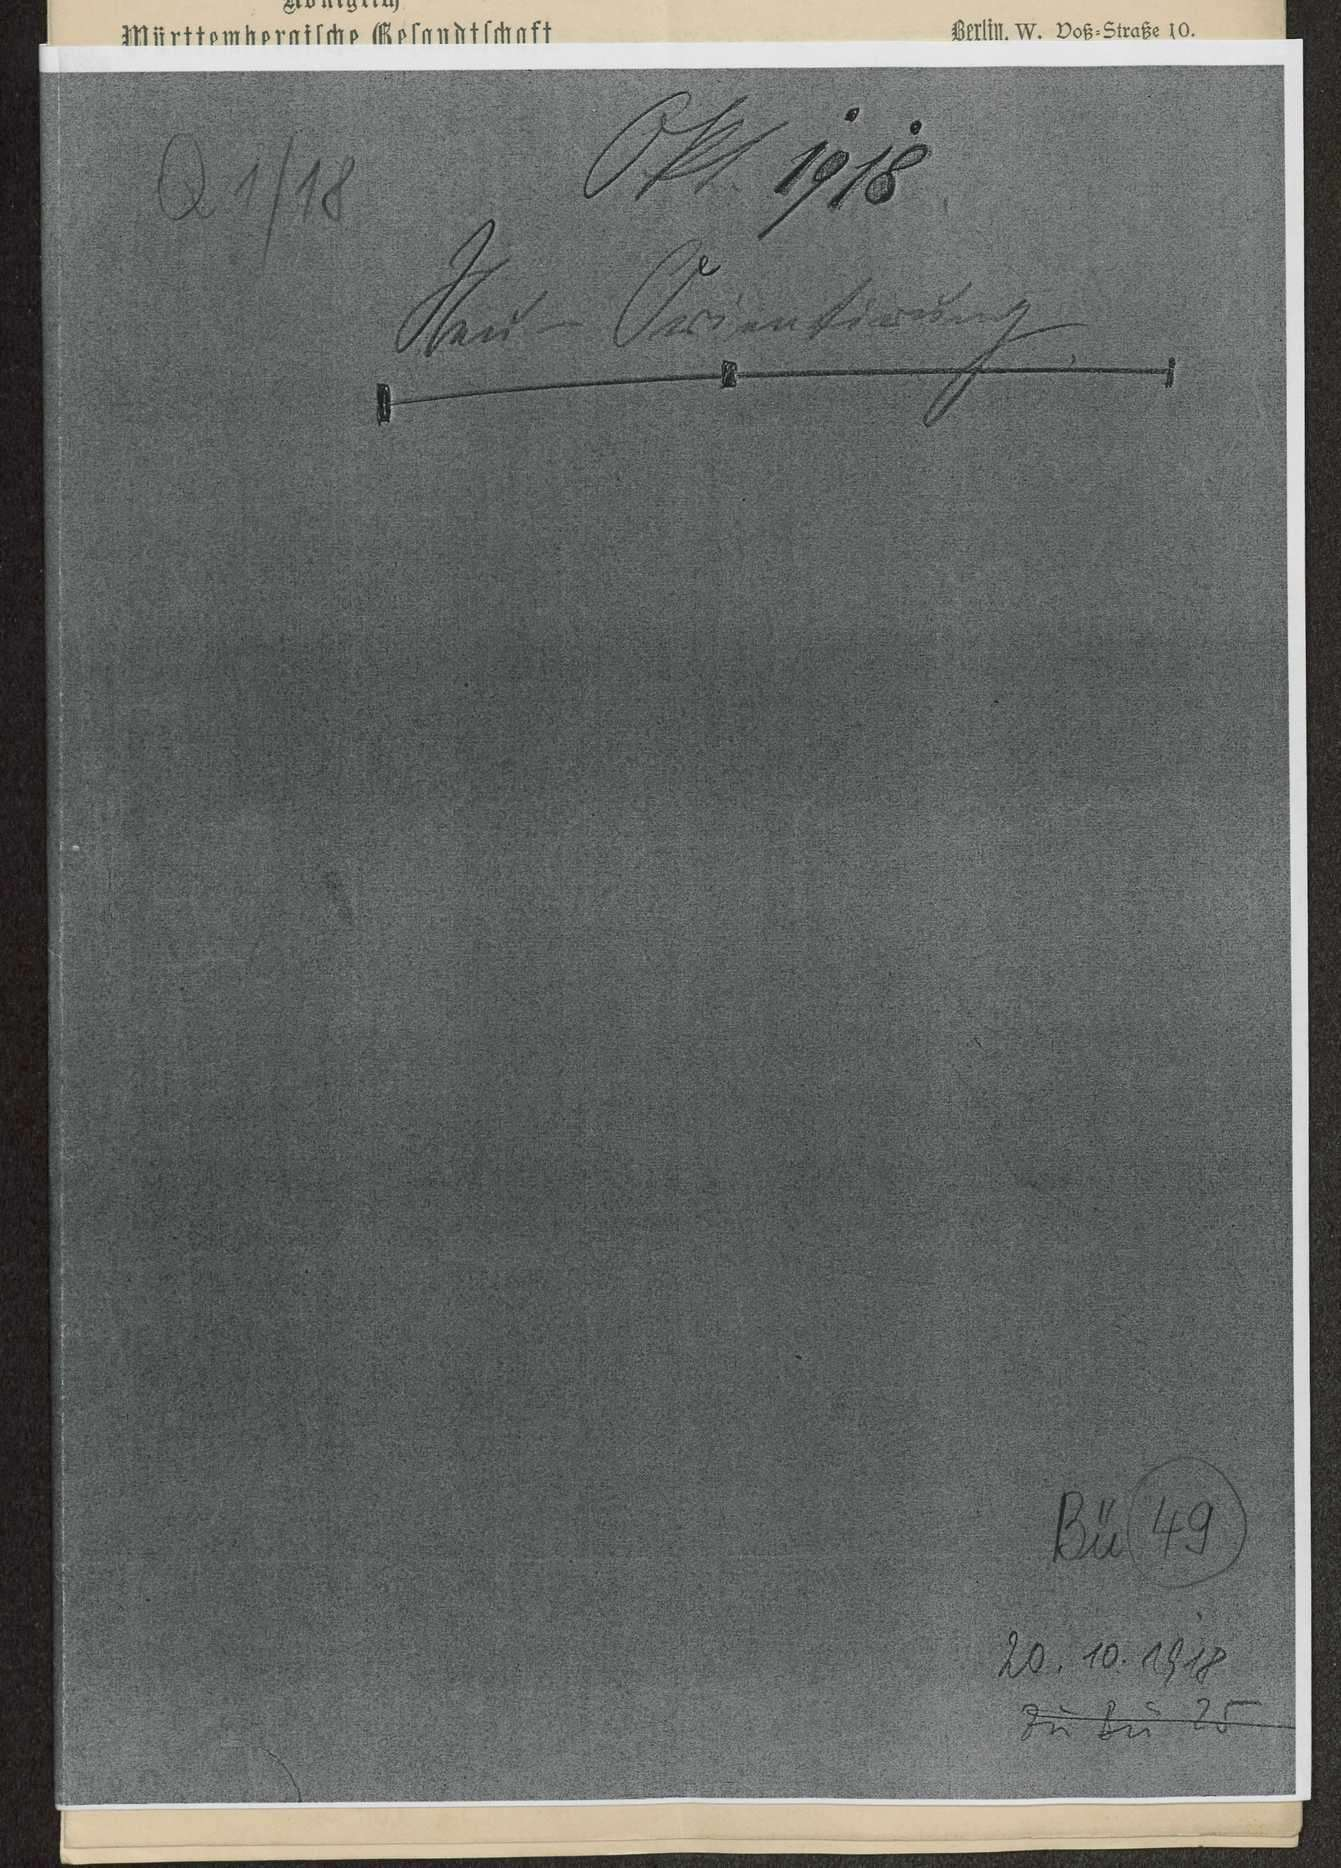 Sitzungen des VIII. Bundesratsausschusses für auswärtige Angelegenheiten am 16. Januar 1917, 9. Mai 1917, 20. August 1917, 26. November 1917, 2. Januar 1918, 22. Mai 1918 und 20. Okotber 1918. Protokolle, Notizen, Berichte, Bild 1